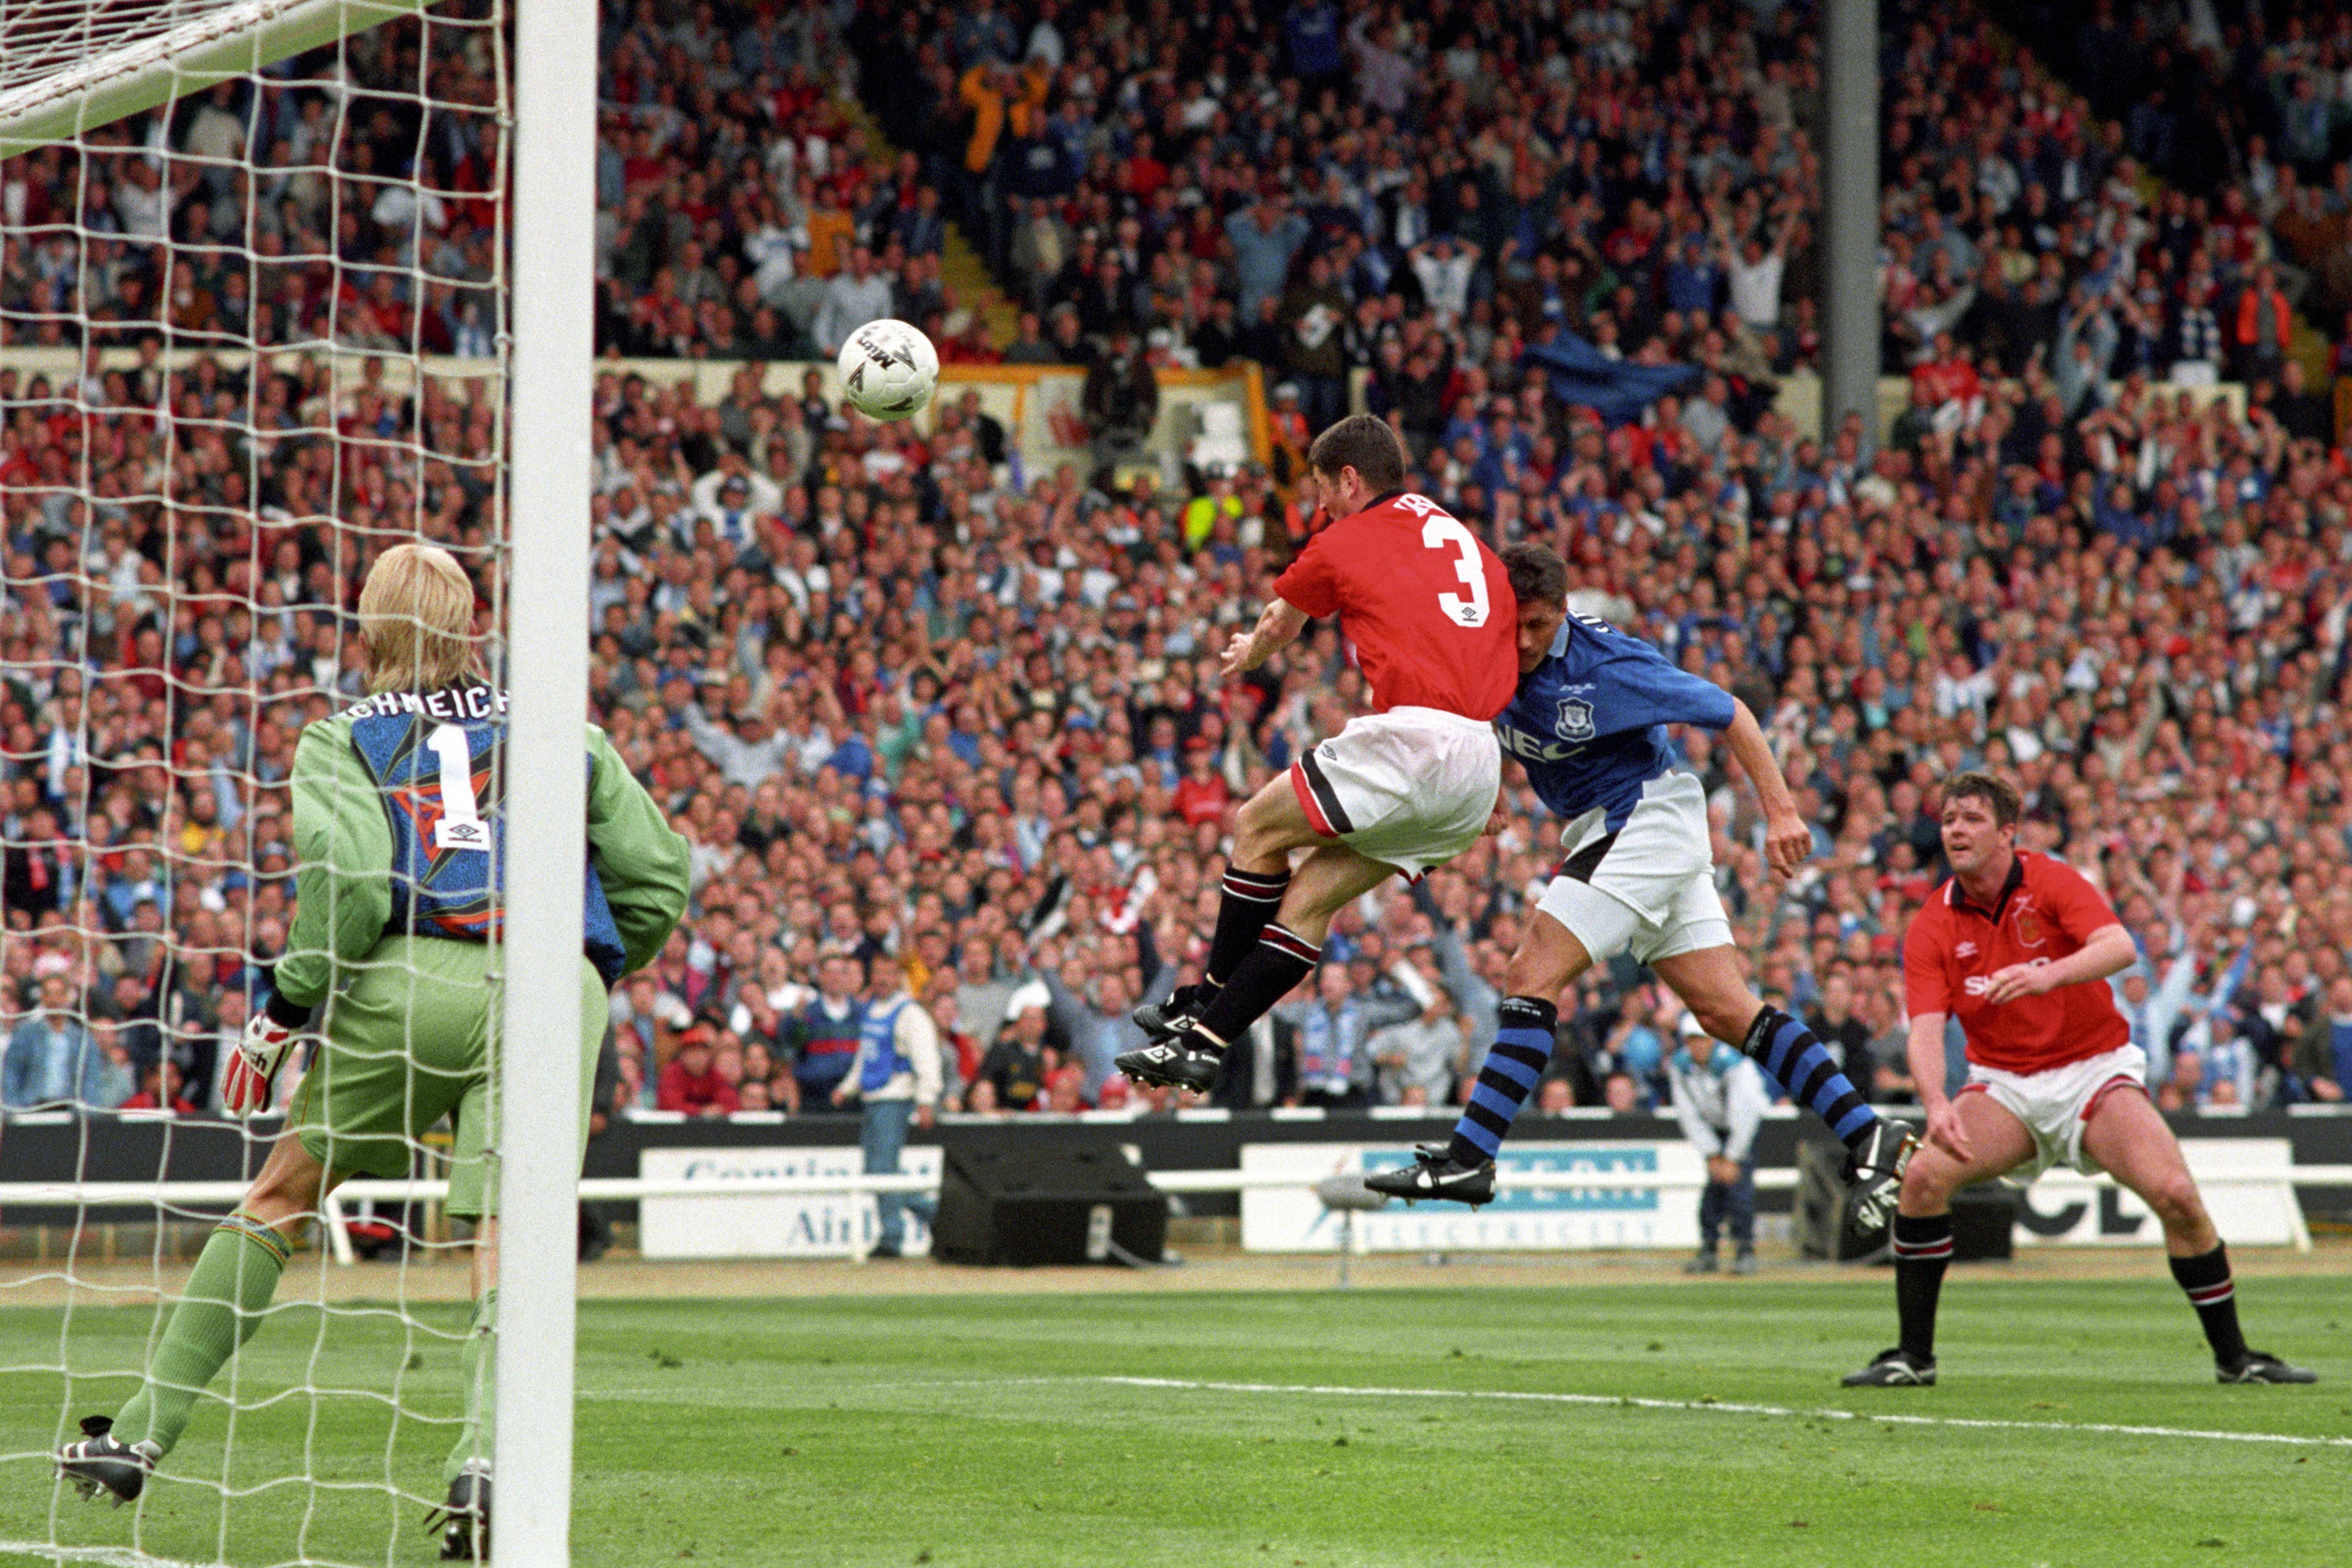 Soccer - FA Cup Final - Manchester United v Everton - Wembley Stadium